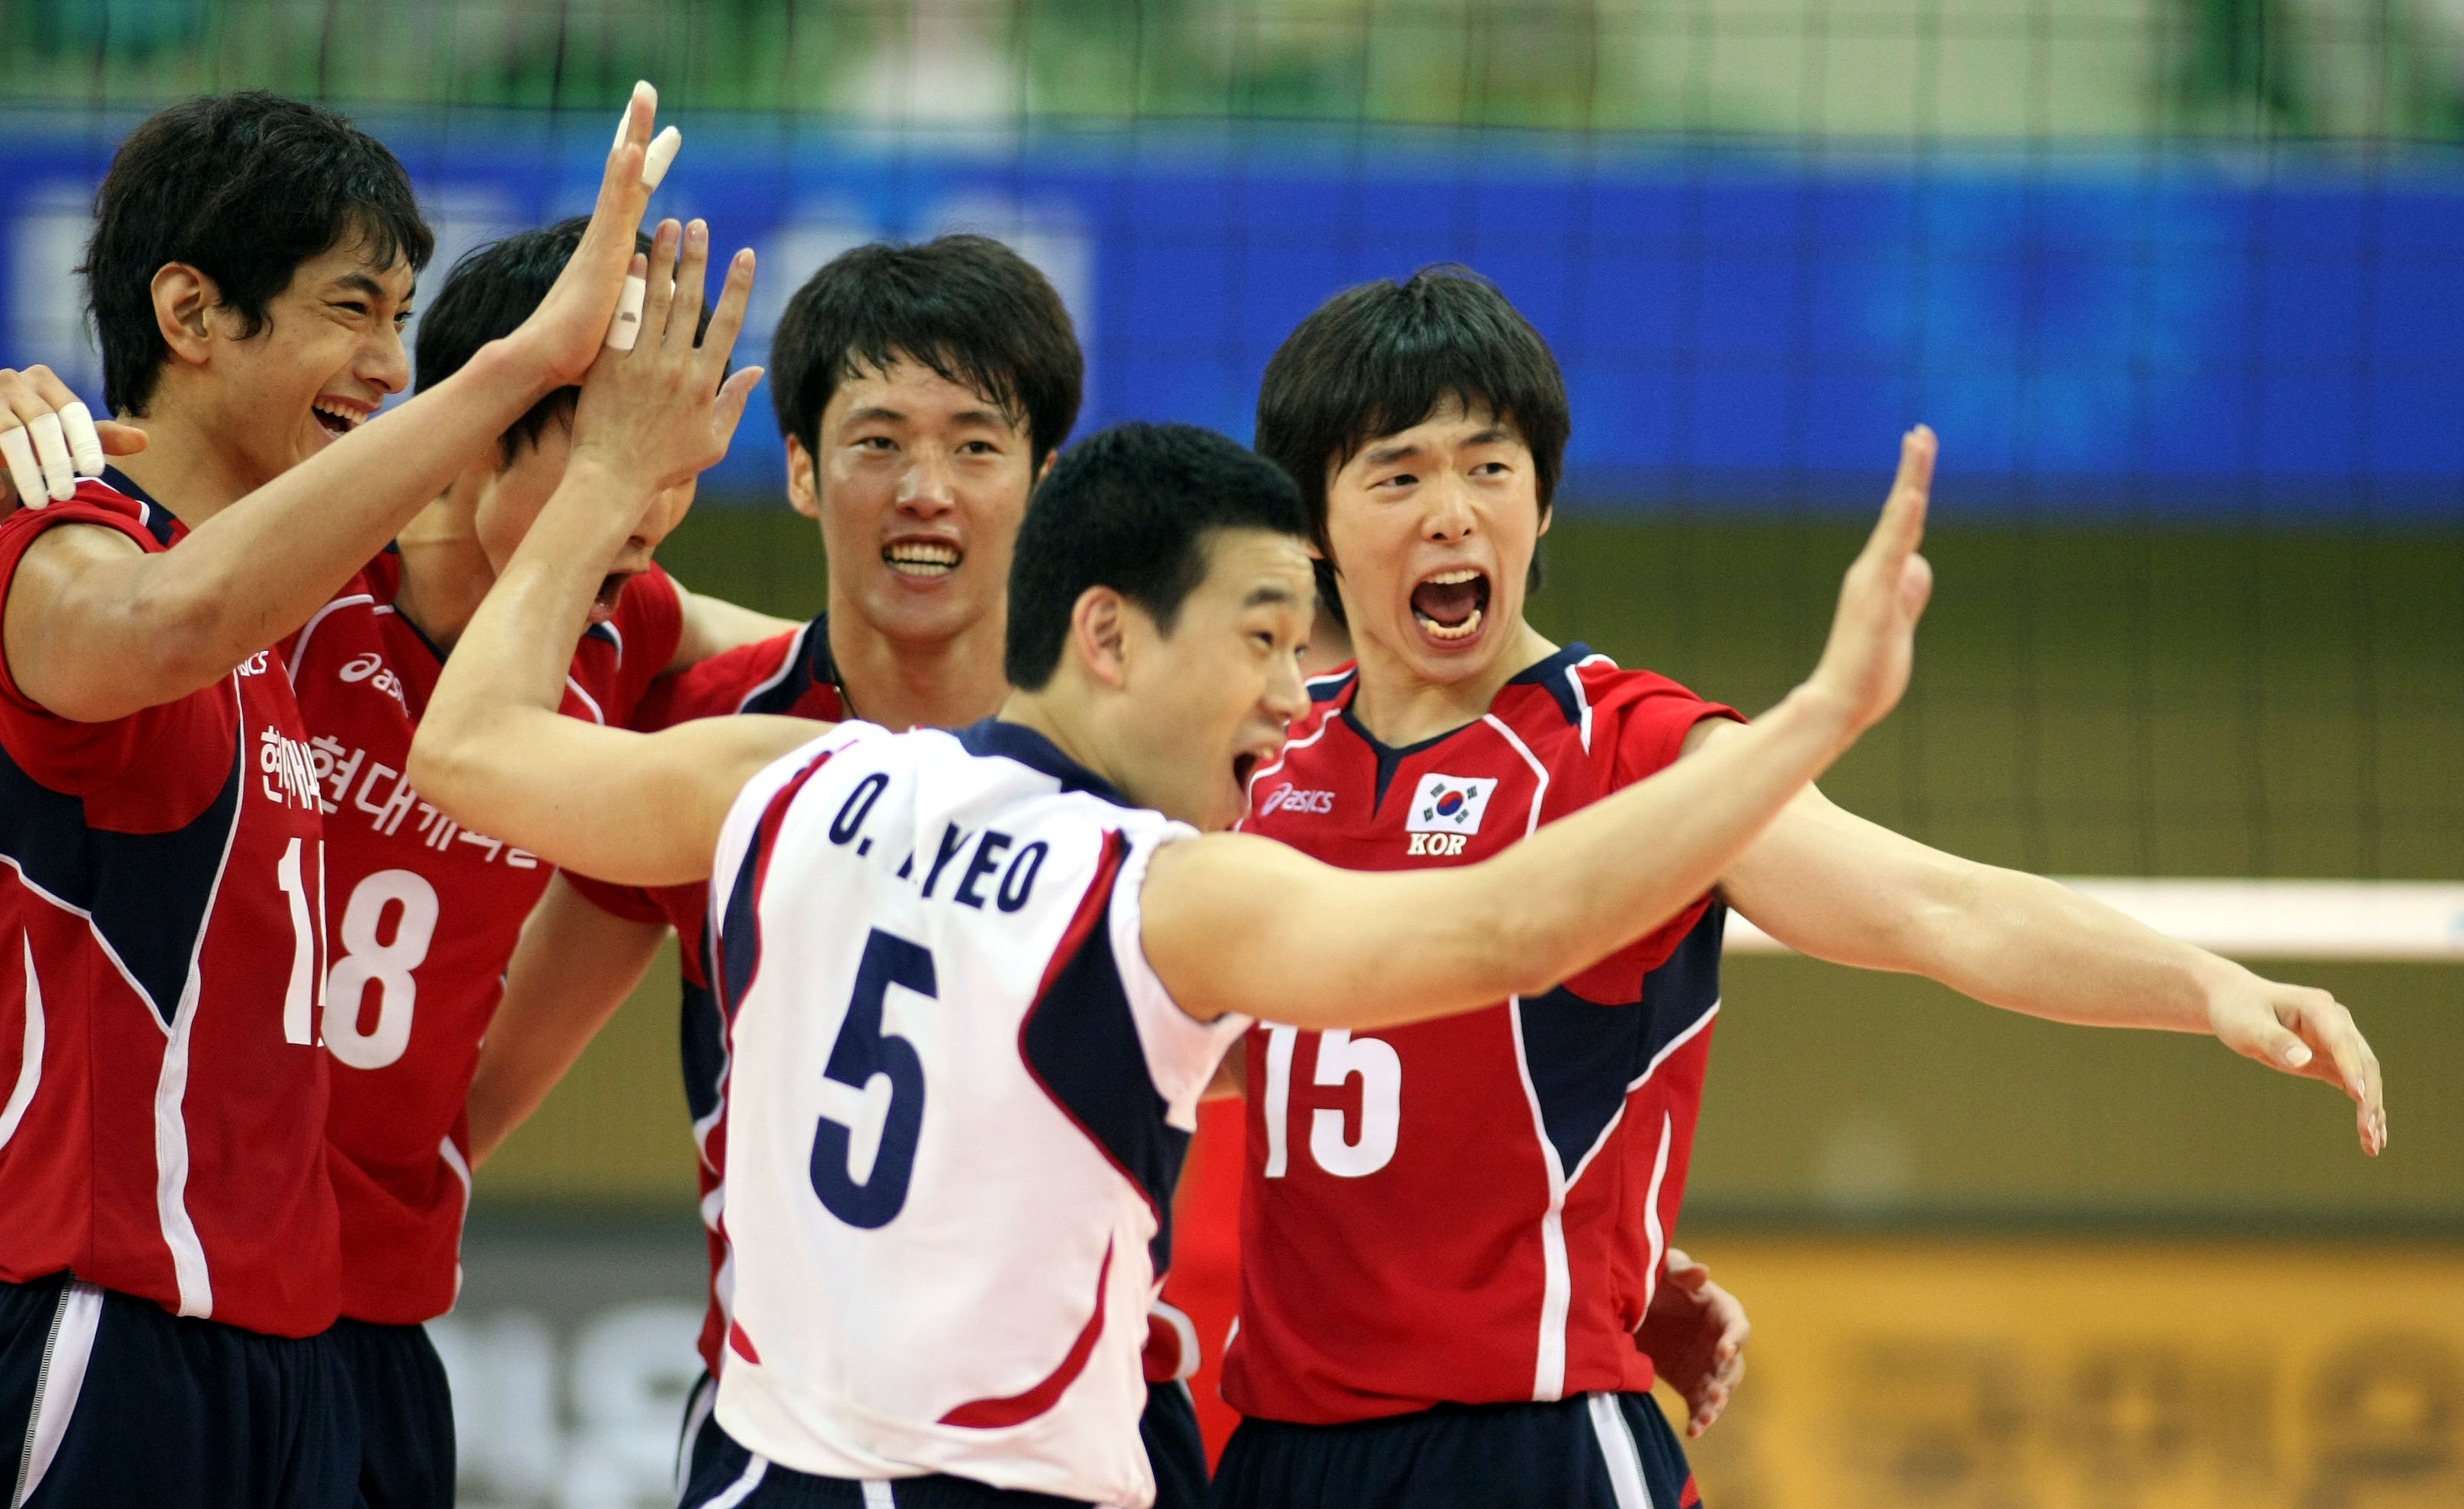 NO-011 06/14/2009 KOR vs  ARG  The Korean players succeed